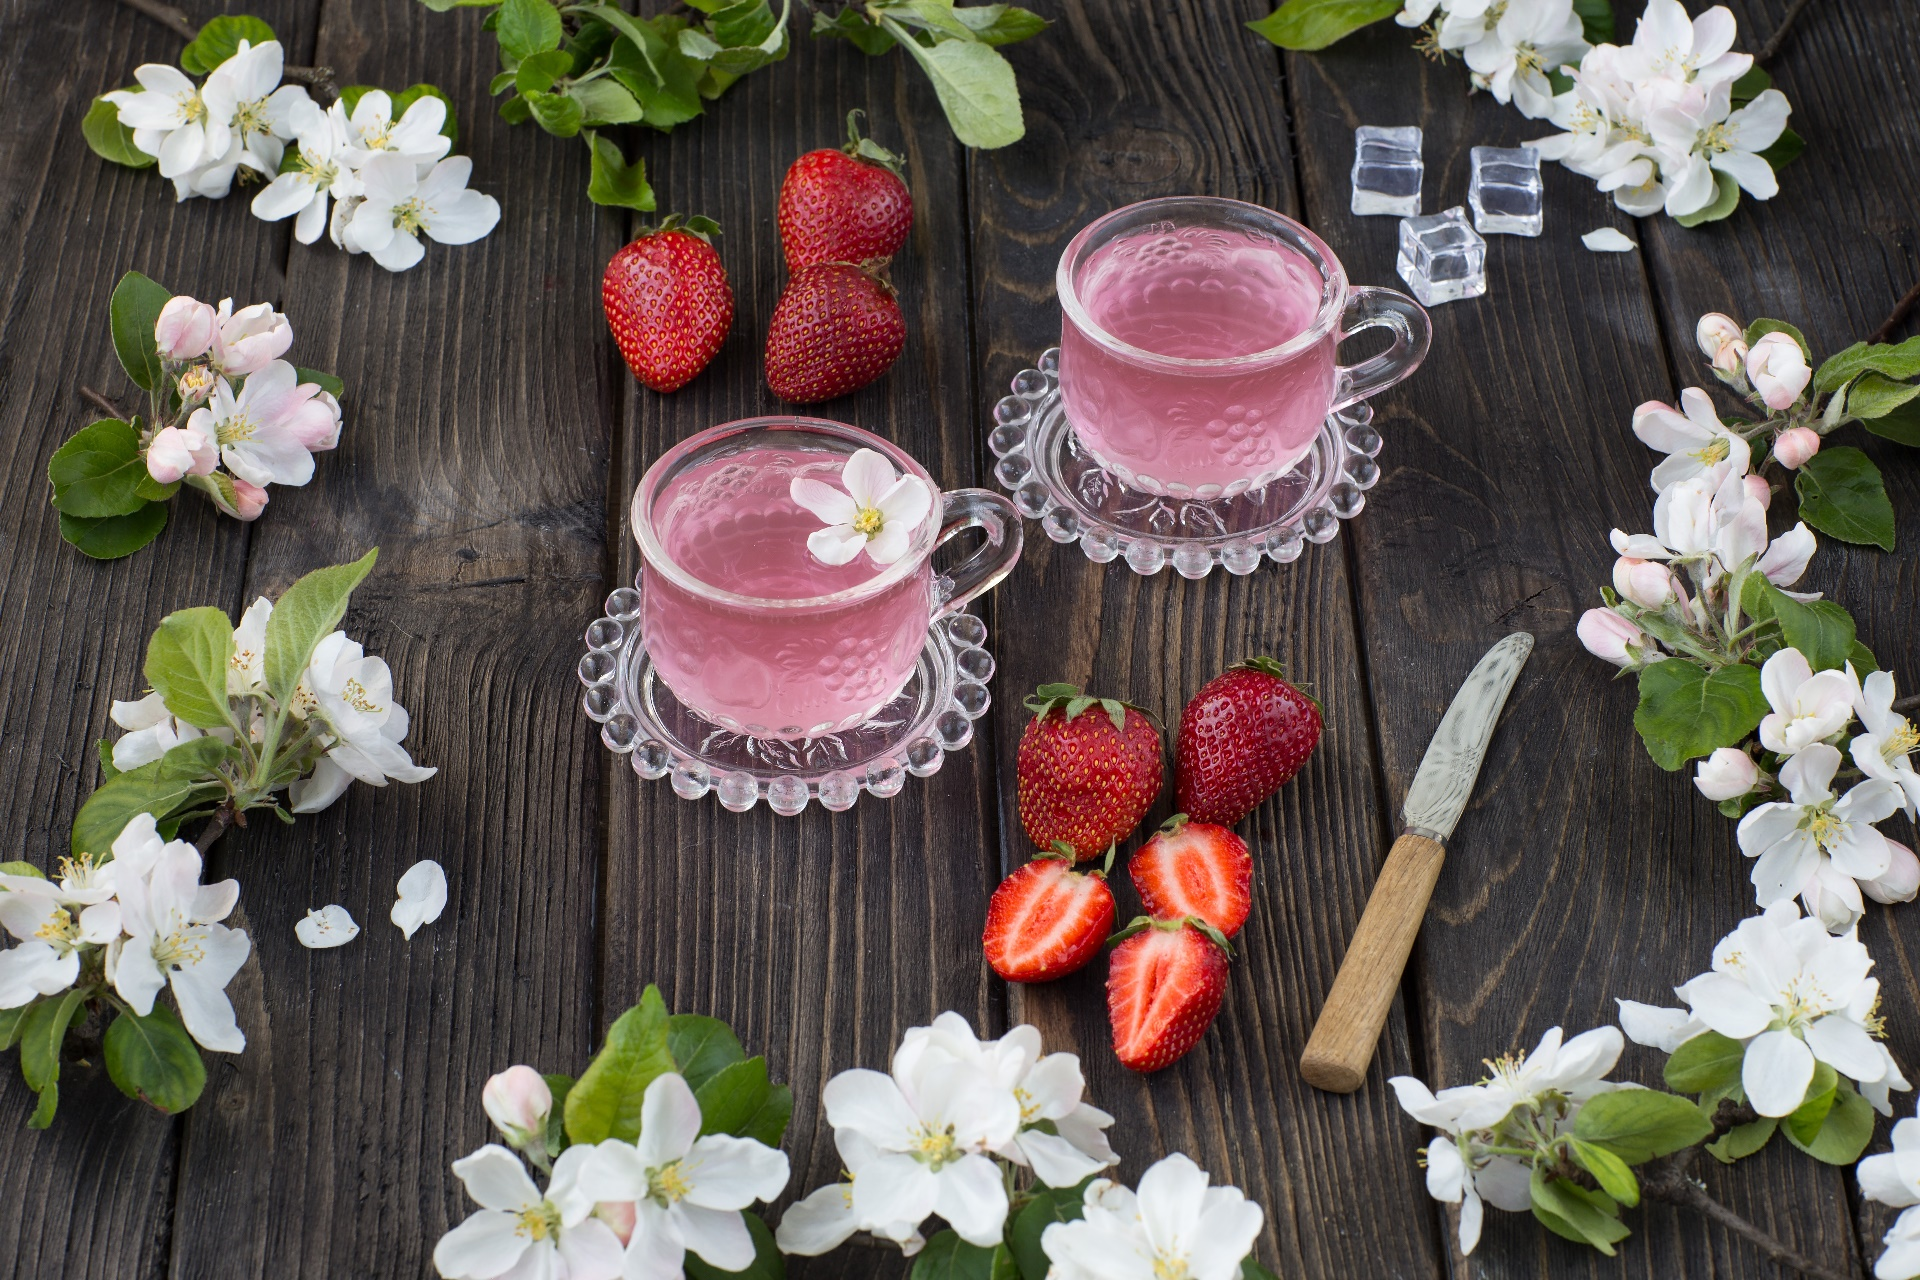 General 1920x1280 colorful flowers strawberries food fruit pink